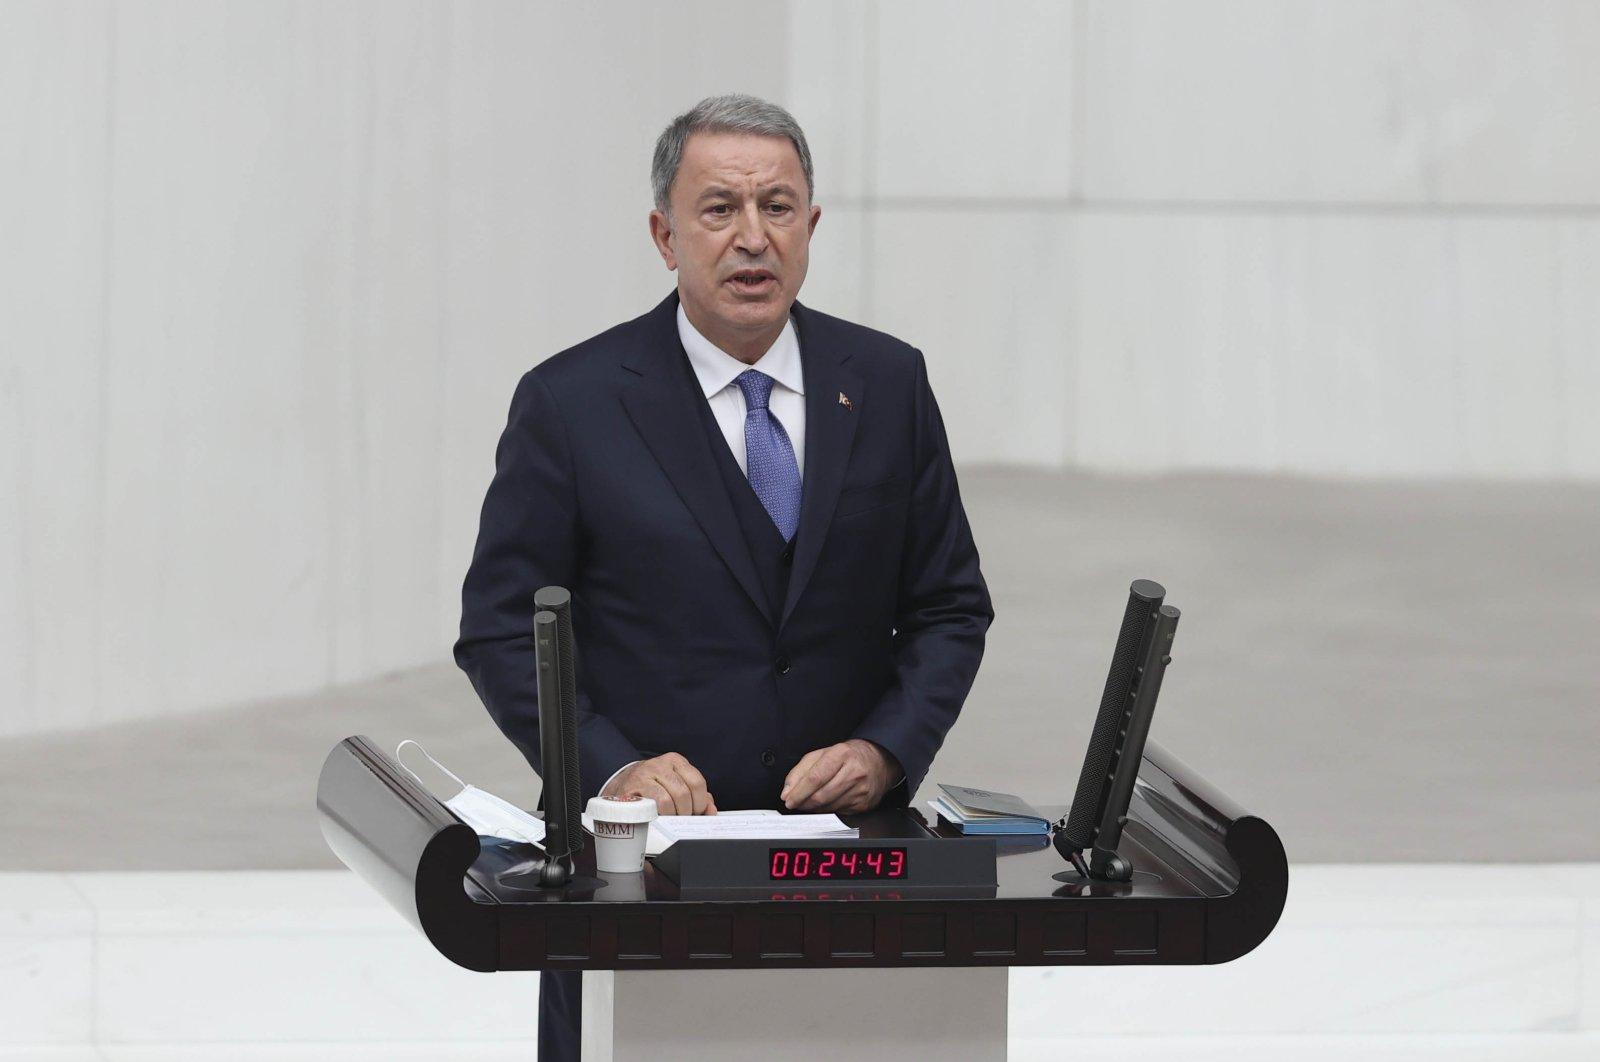 Defense Minister Hulusi Akar speaks during the 2021 budget debates in the Turkish Parliament, Ankara, Turkey, Dec. 9, 2020. (AA Photo)